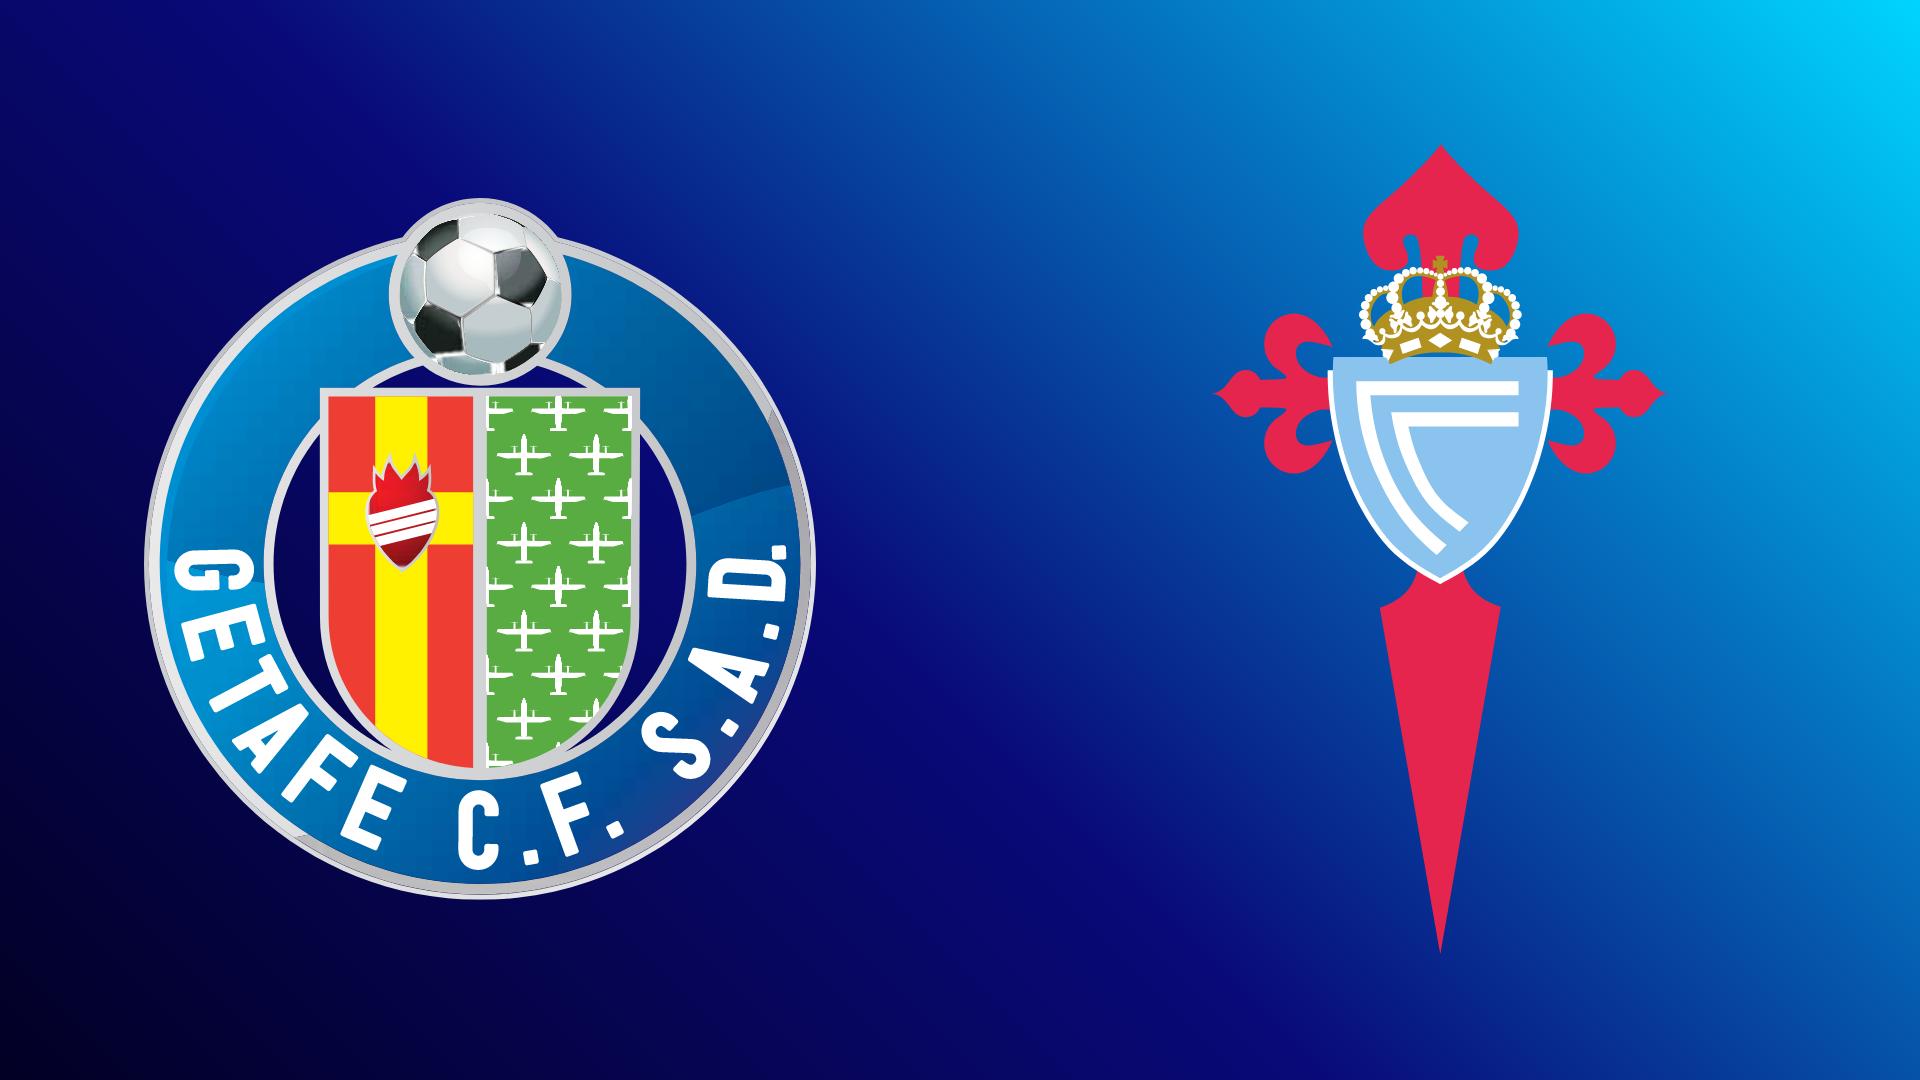 Getafe - Celta Vigo 25.10.2021 um 21:00 Uhr auf DAZN